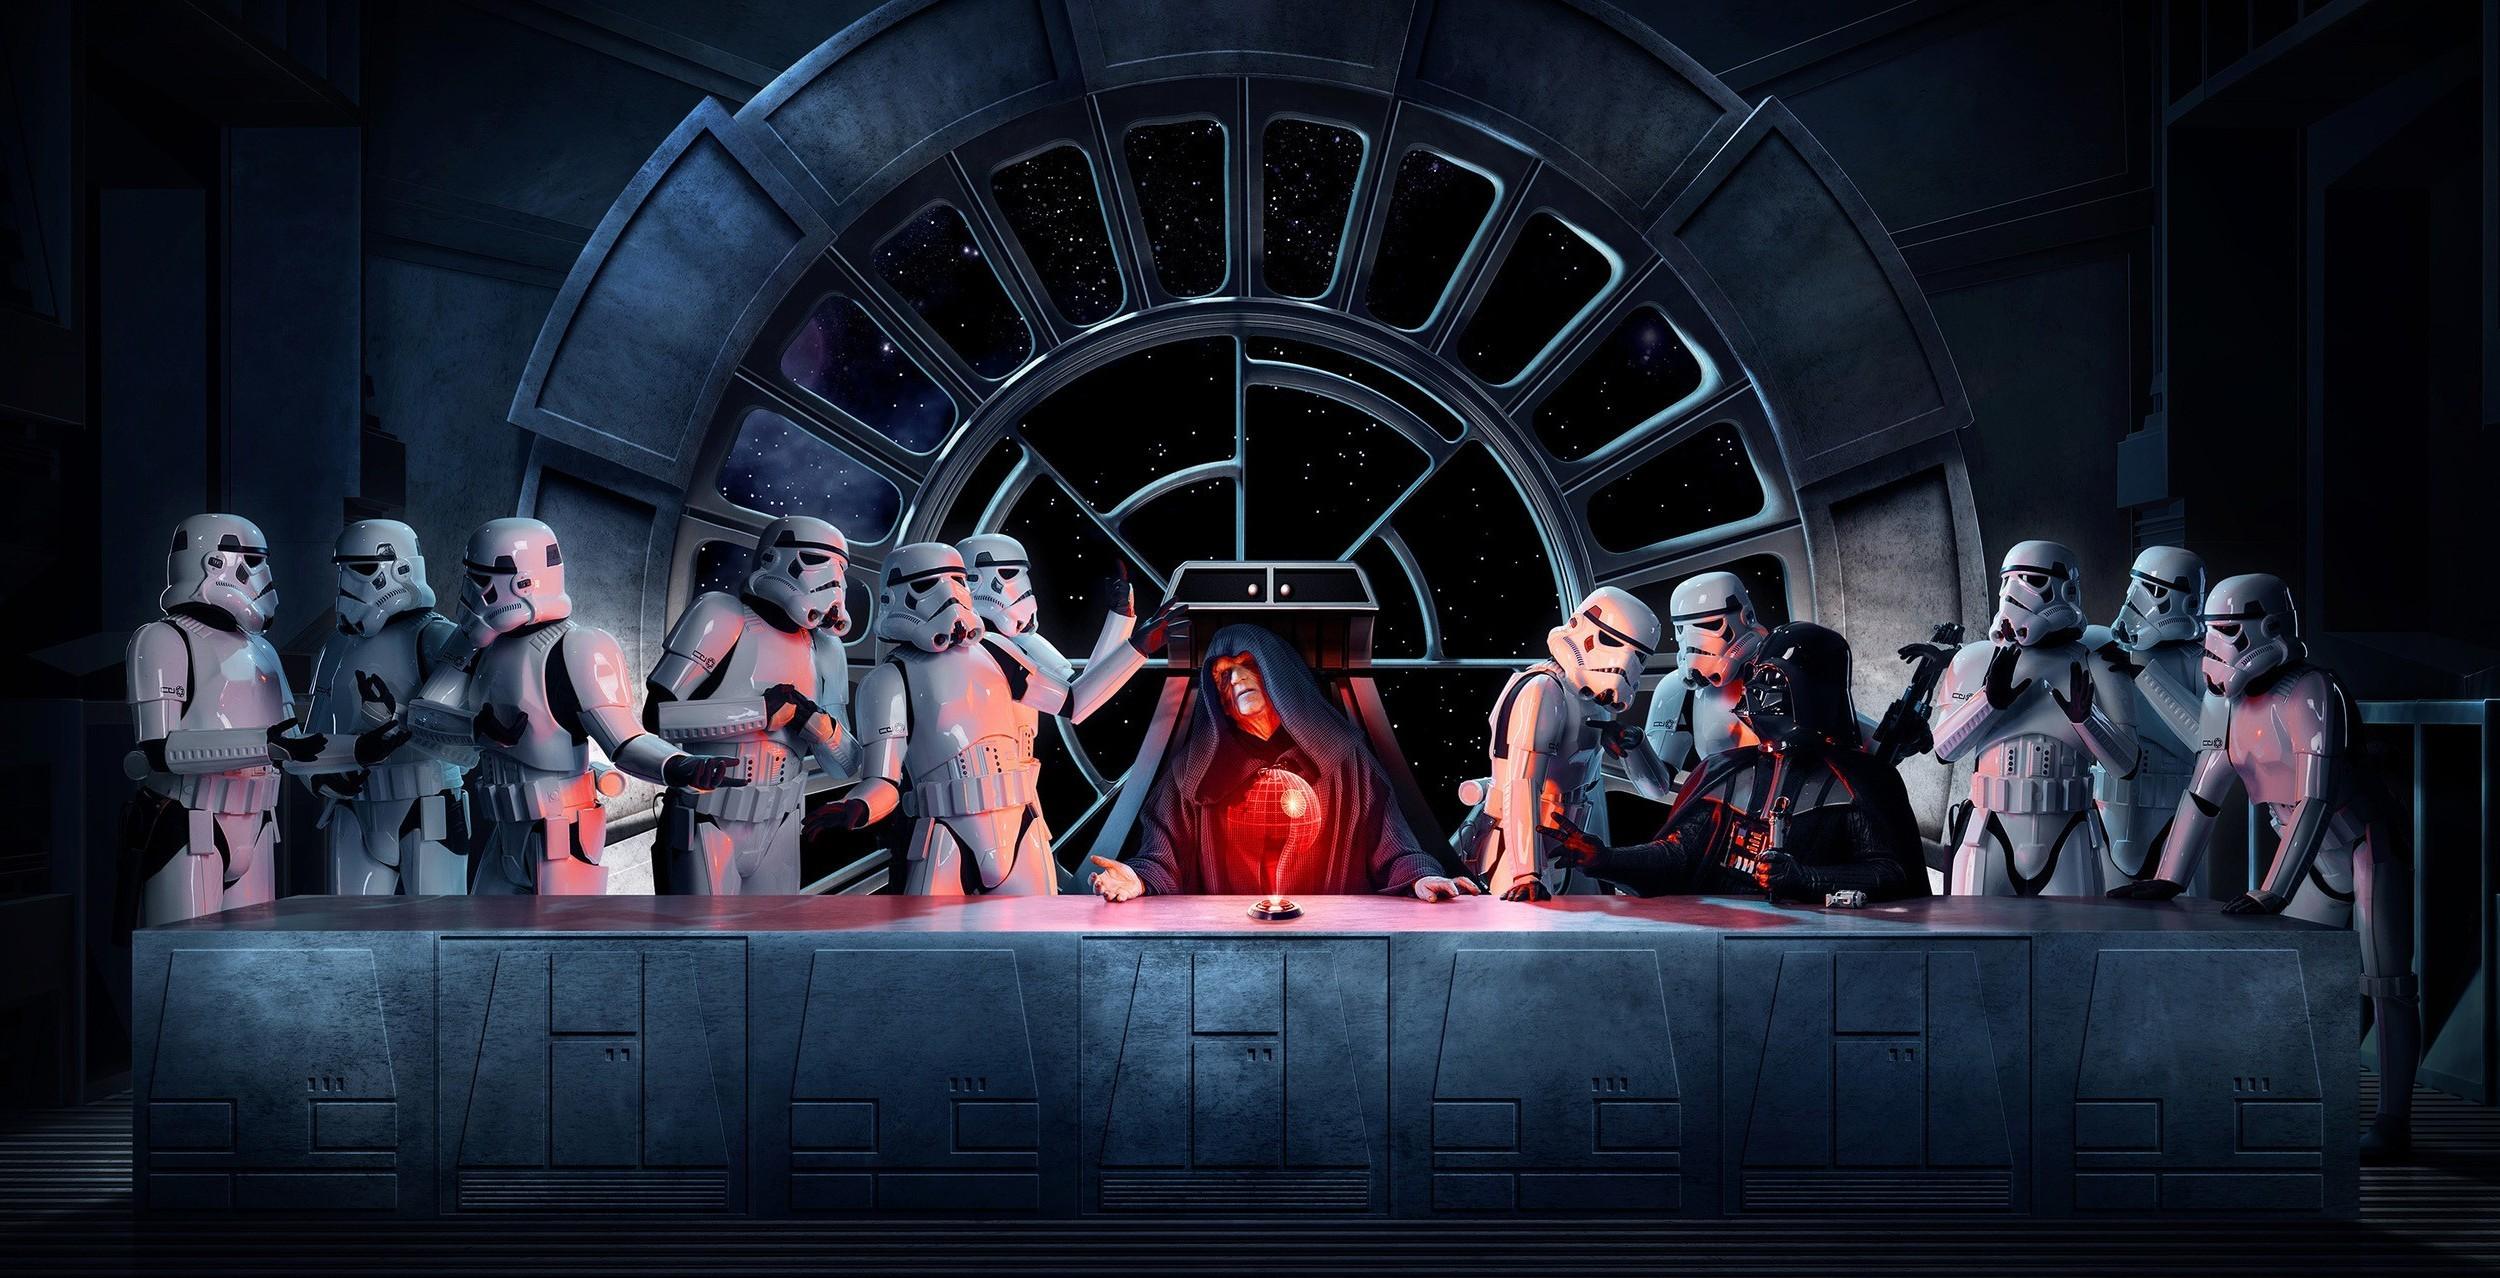 Darth Vader, Emperor Palpatine, Stormtrooper, Star Wars, The Last Supper